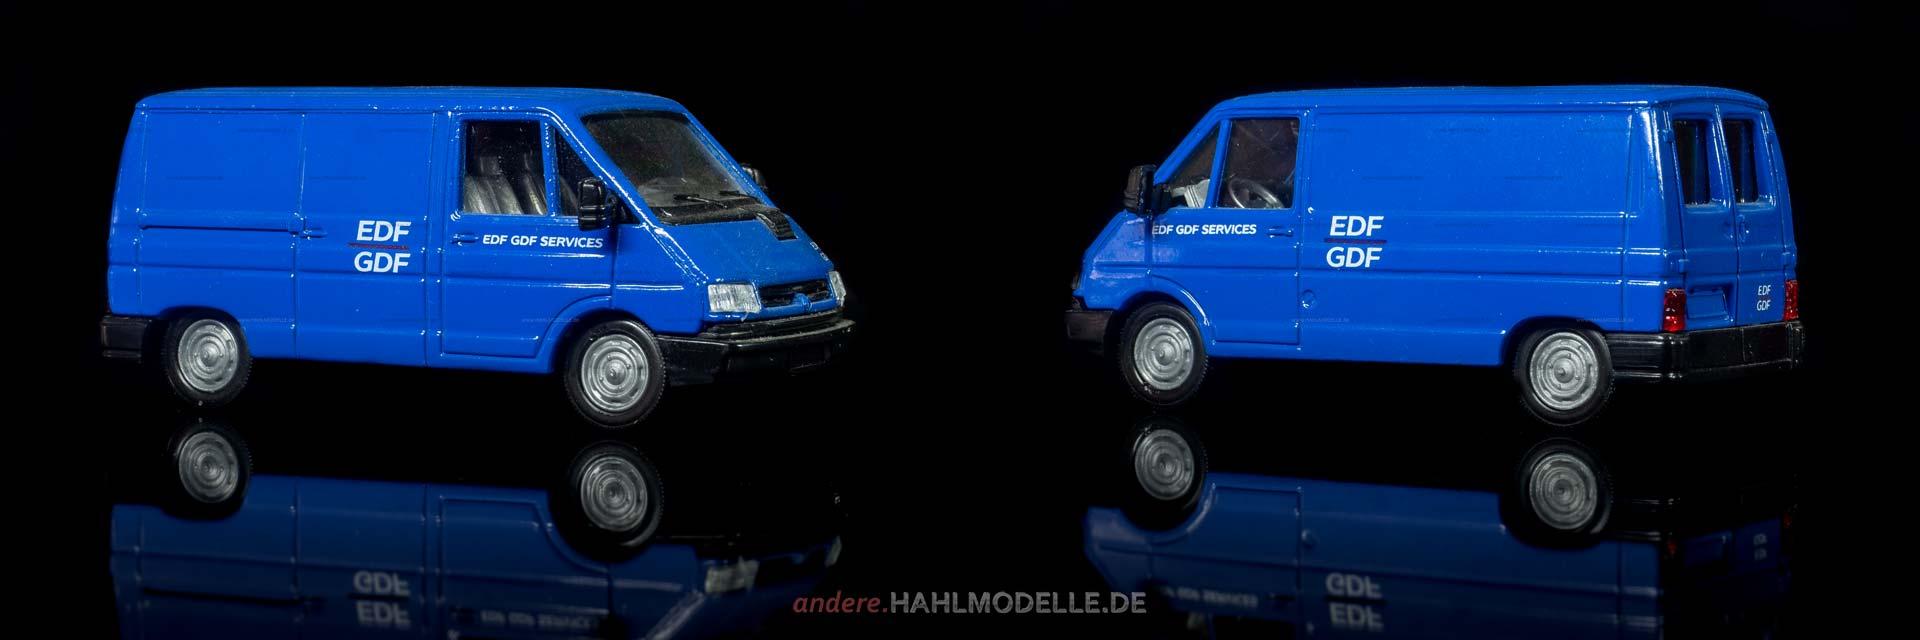 Renault Trafic | Kastenwagen | Solido | 1:48 | www.andere.hahlmodelle.de